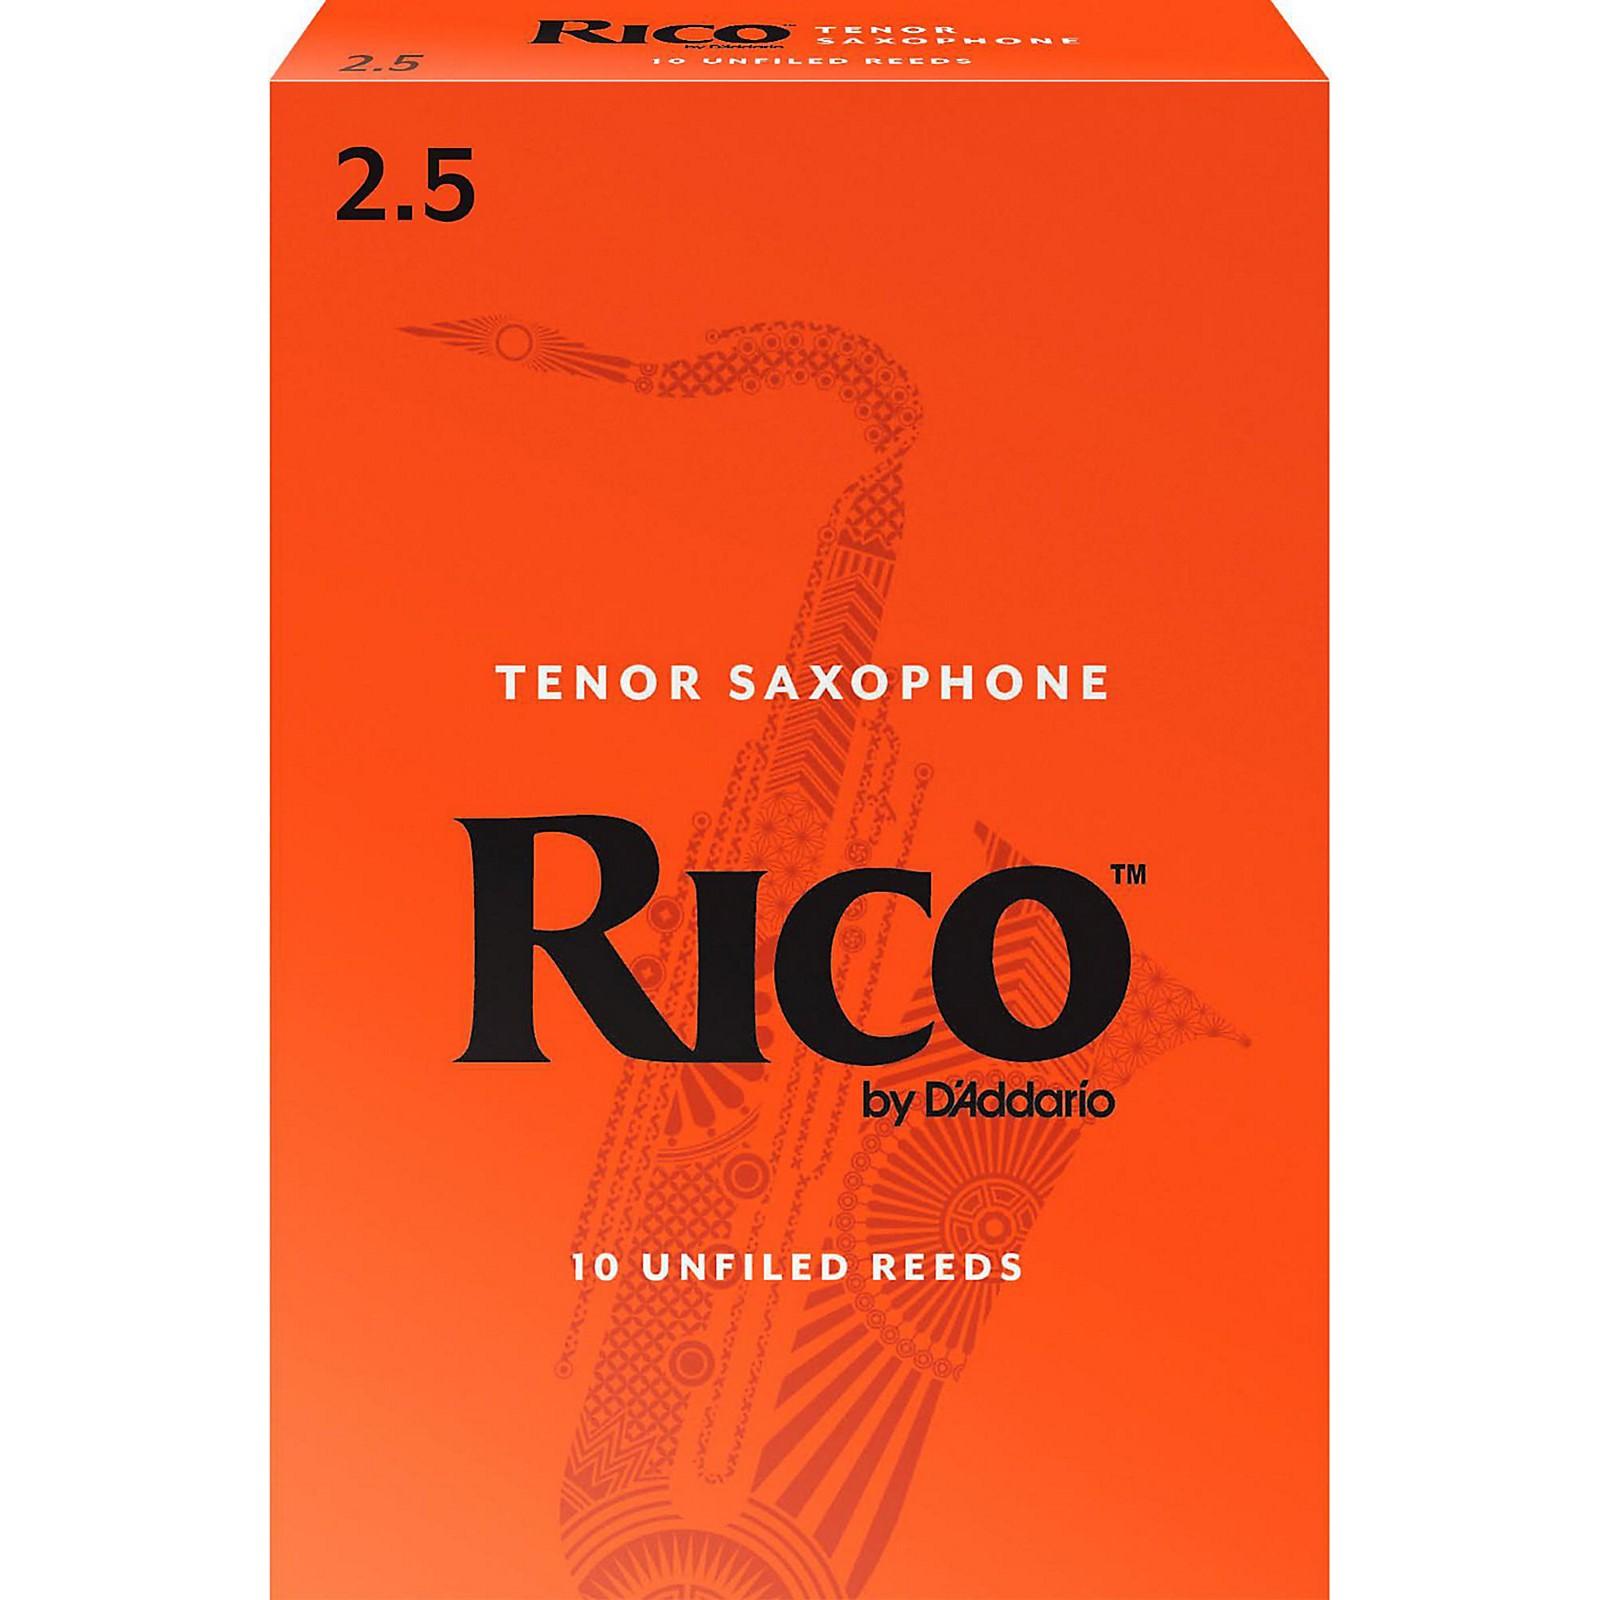 Rico Tenor Saxophone Reeds, Box of 10